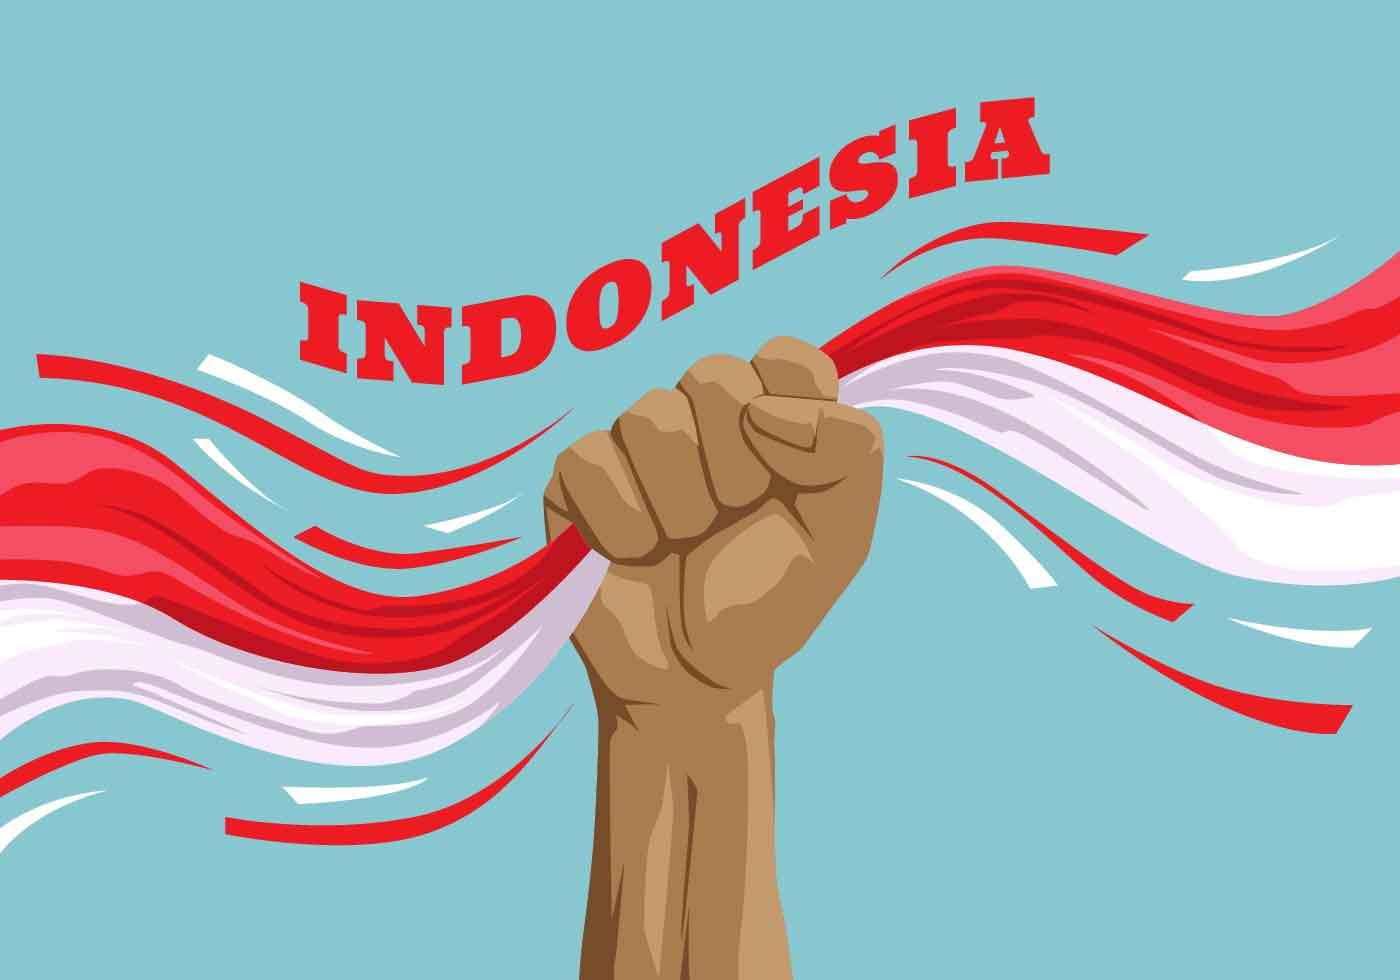 Vector Illustration Web Designs: Indonesia Pride Vector Illustration